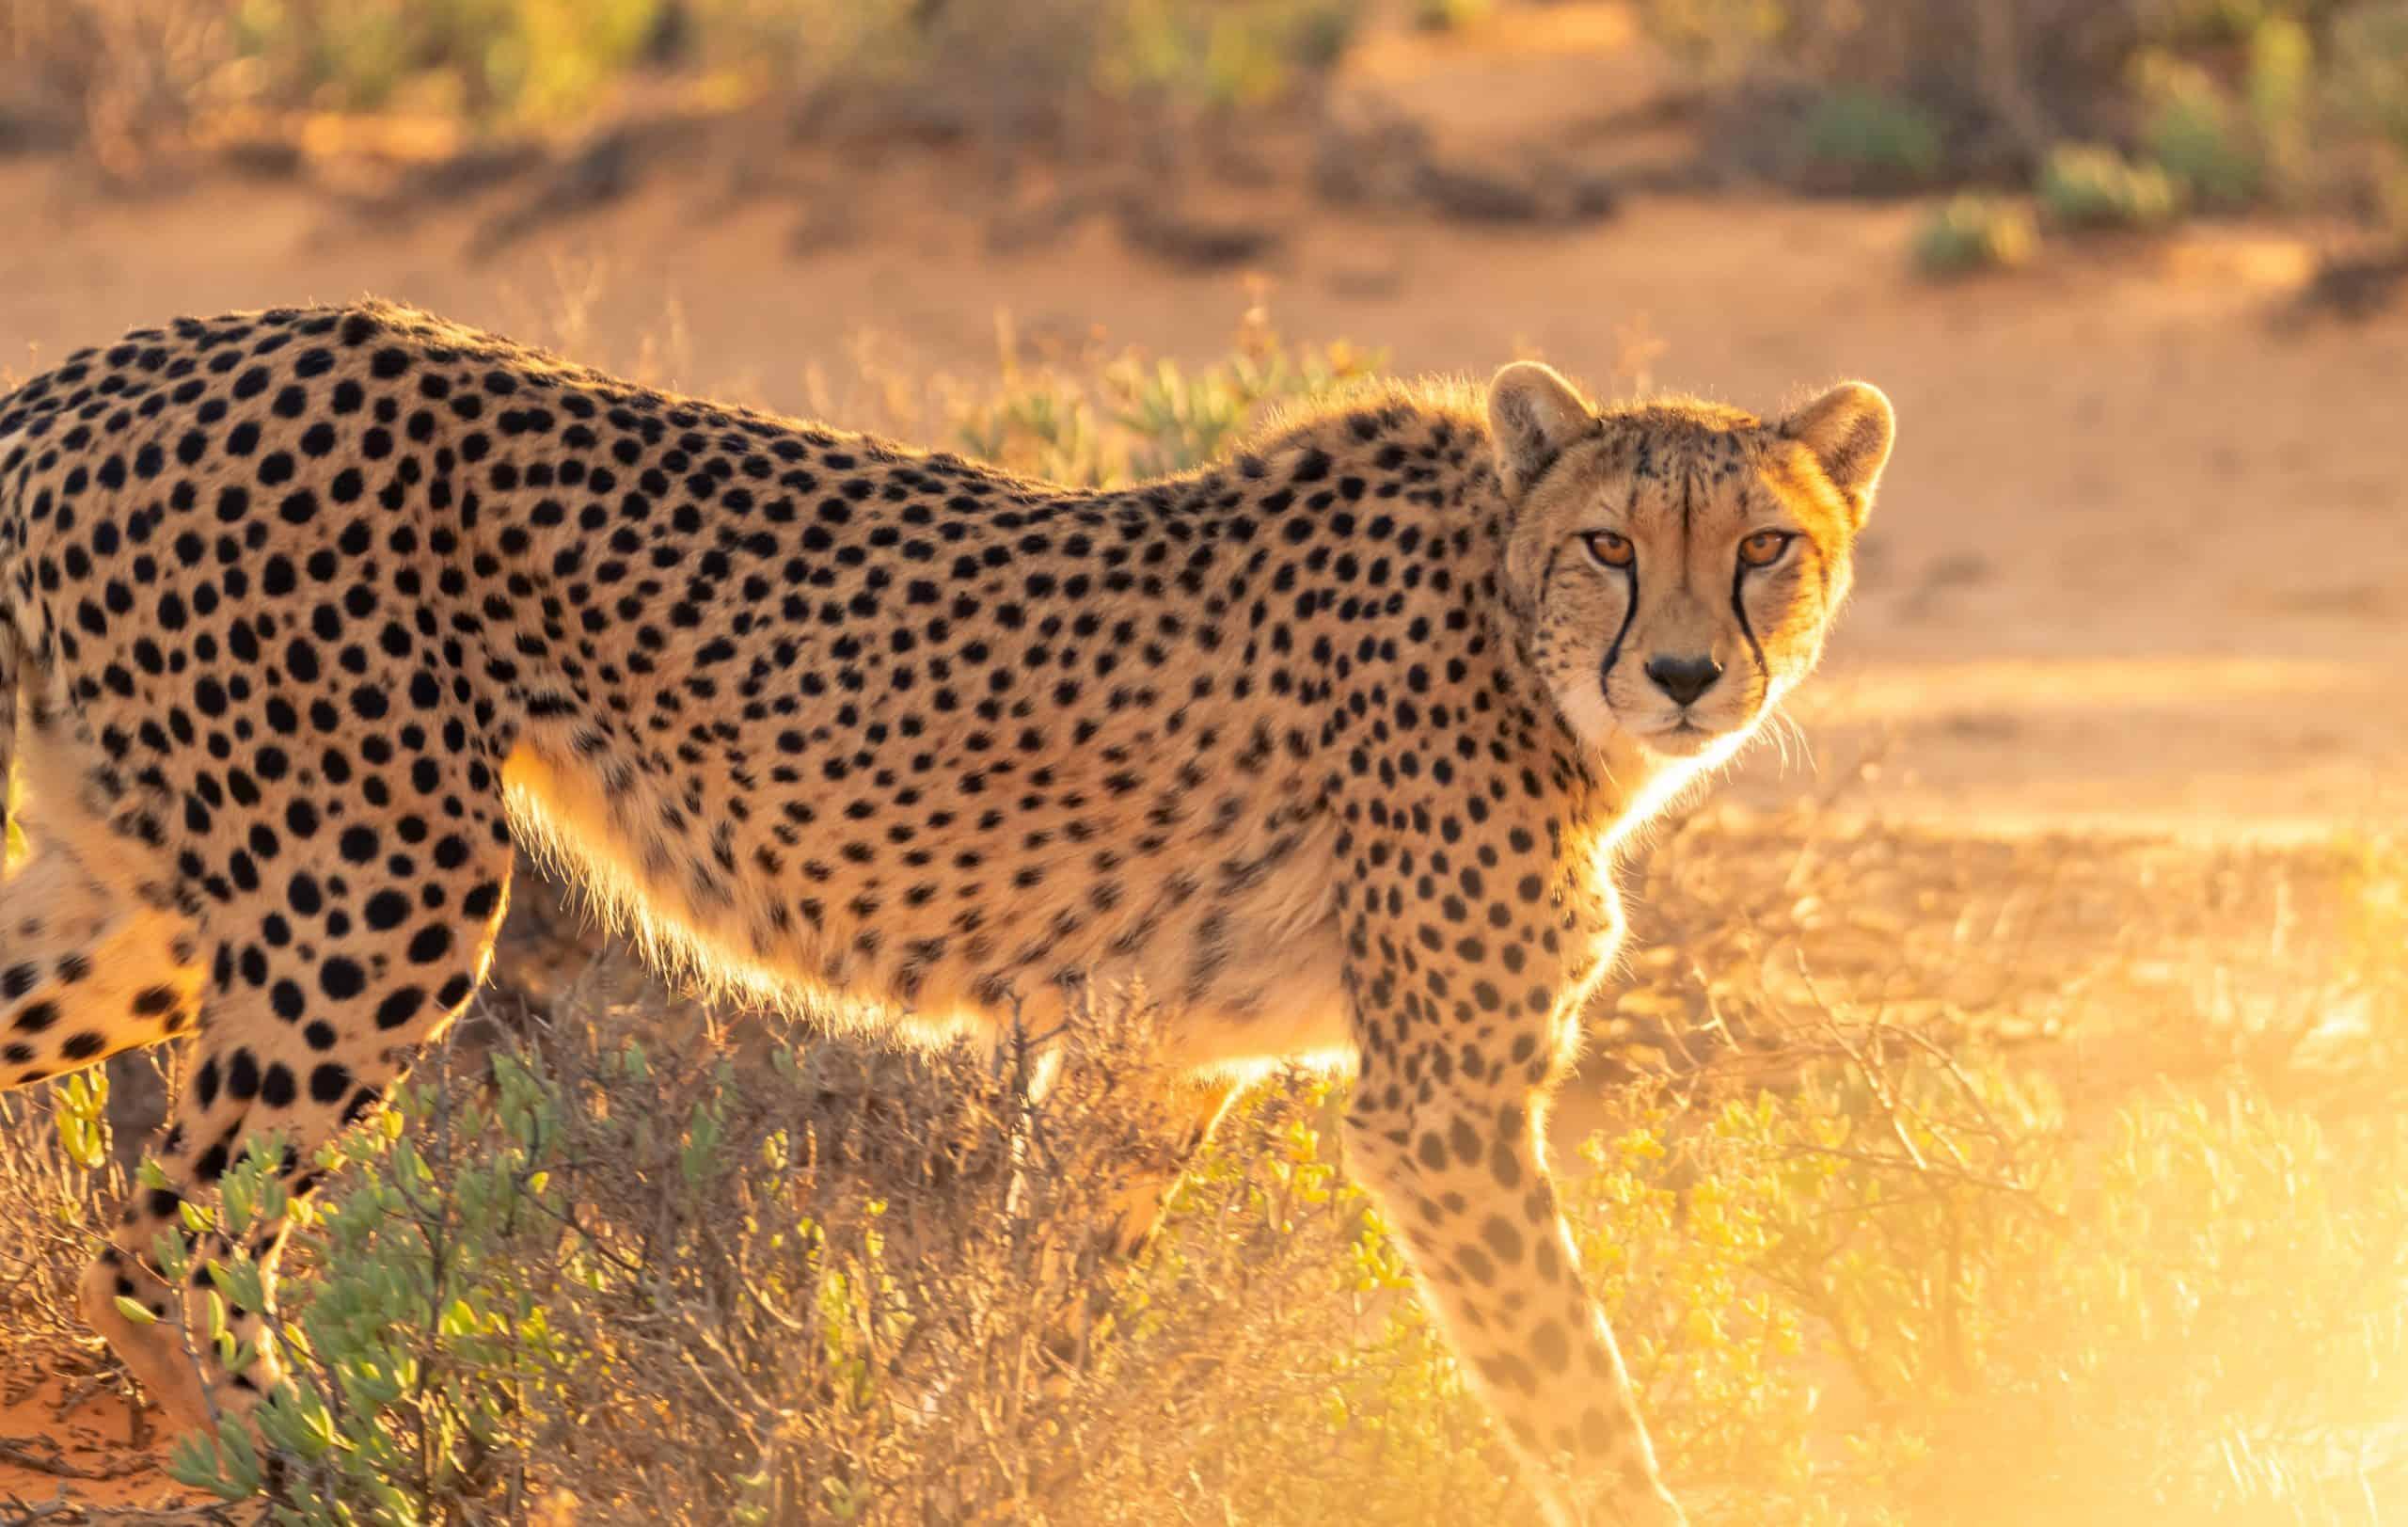 Burigi Chato Safari Tanzania Safari Pictures Serengeti Ngorongoro Lake Manyara Tarangire Arusha National Park (260) Copy